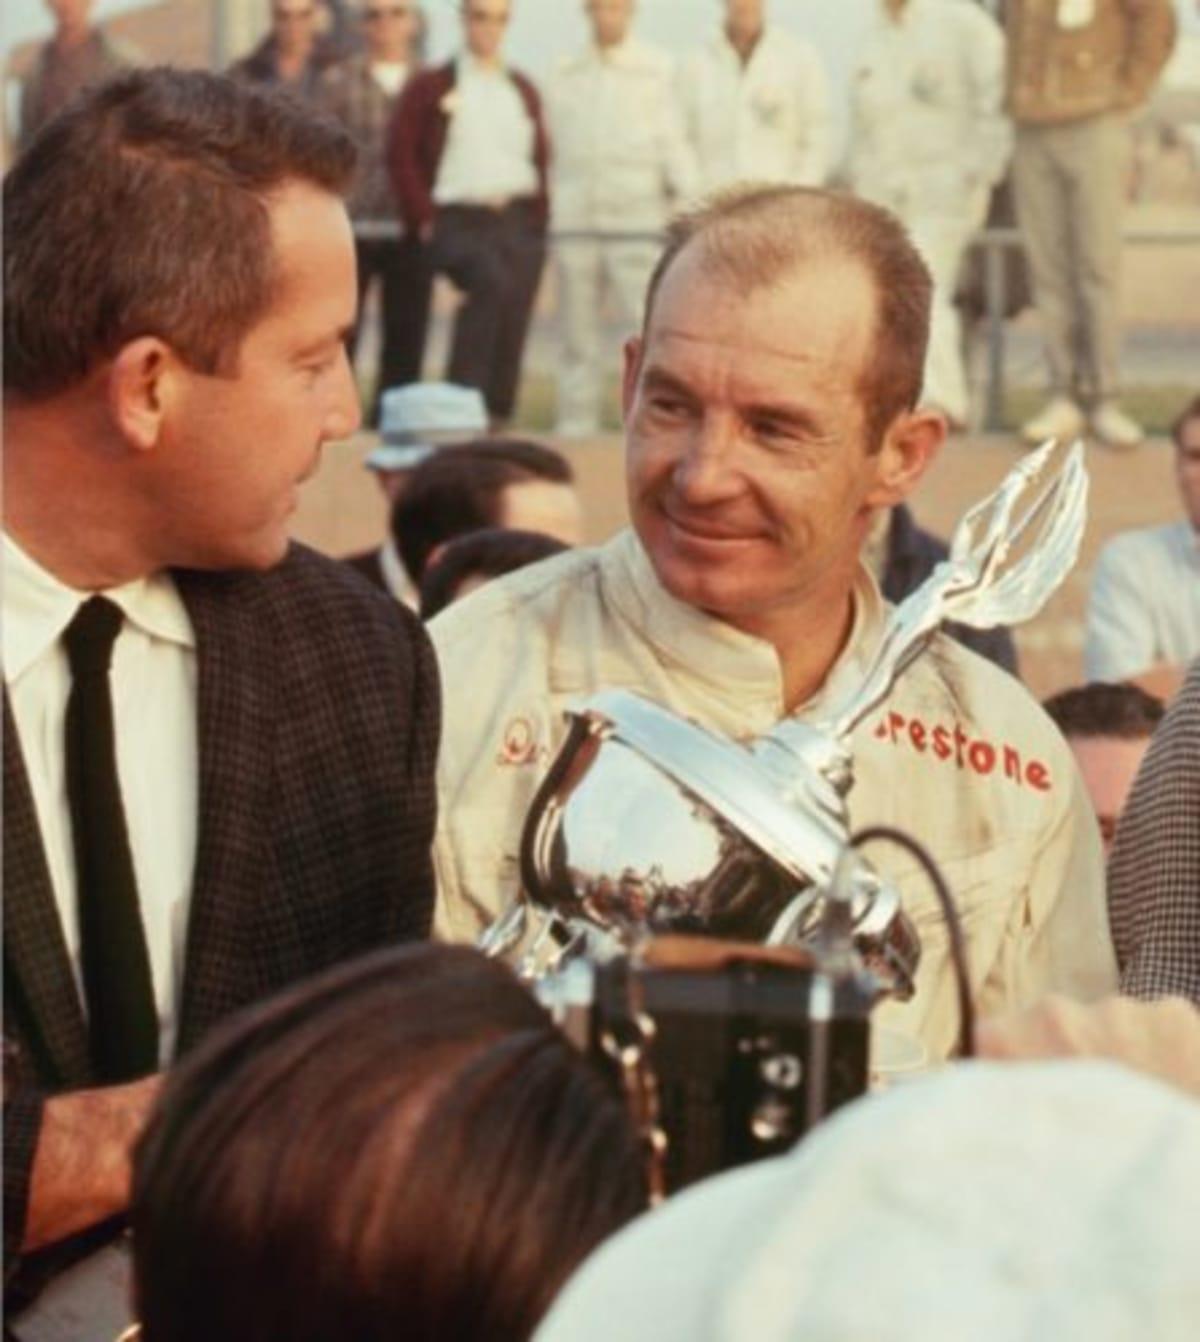 Jones accepts the winner's trophy from race sponsor Robert E Petersen at the 1967 Motor Trend 500 at Riverside International Raceway